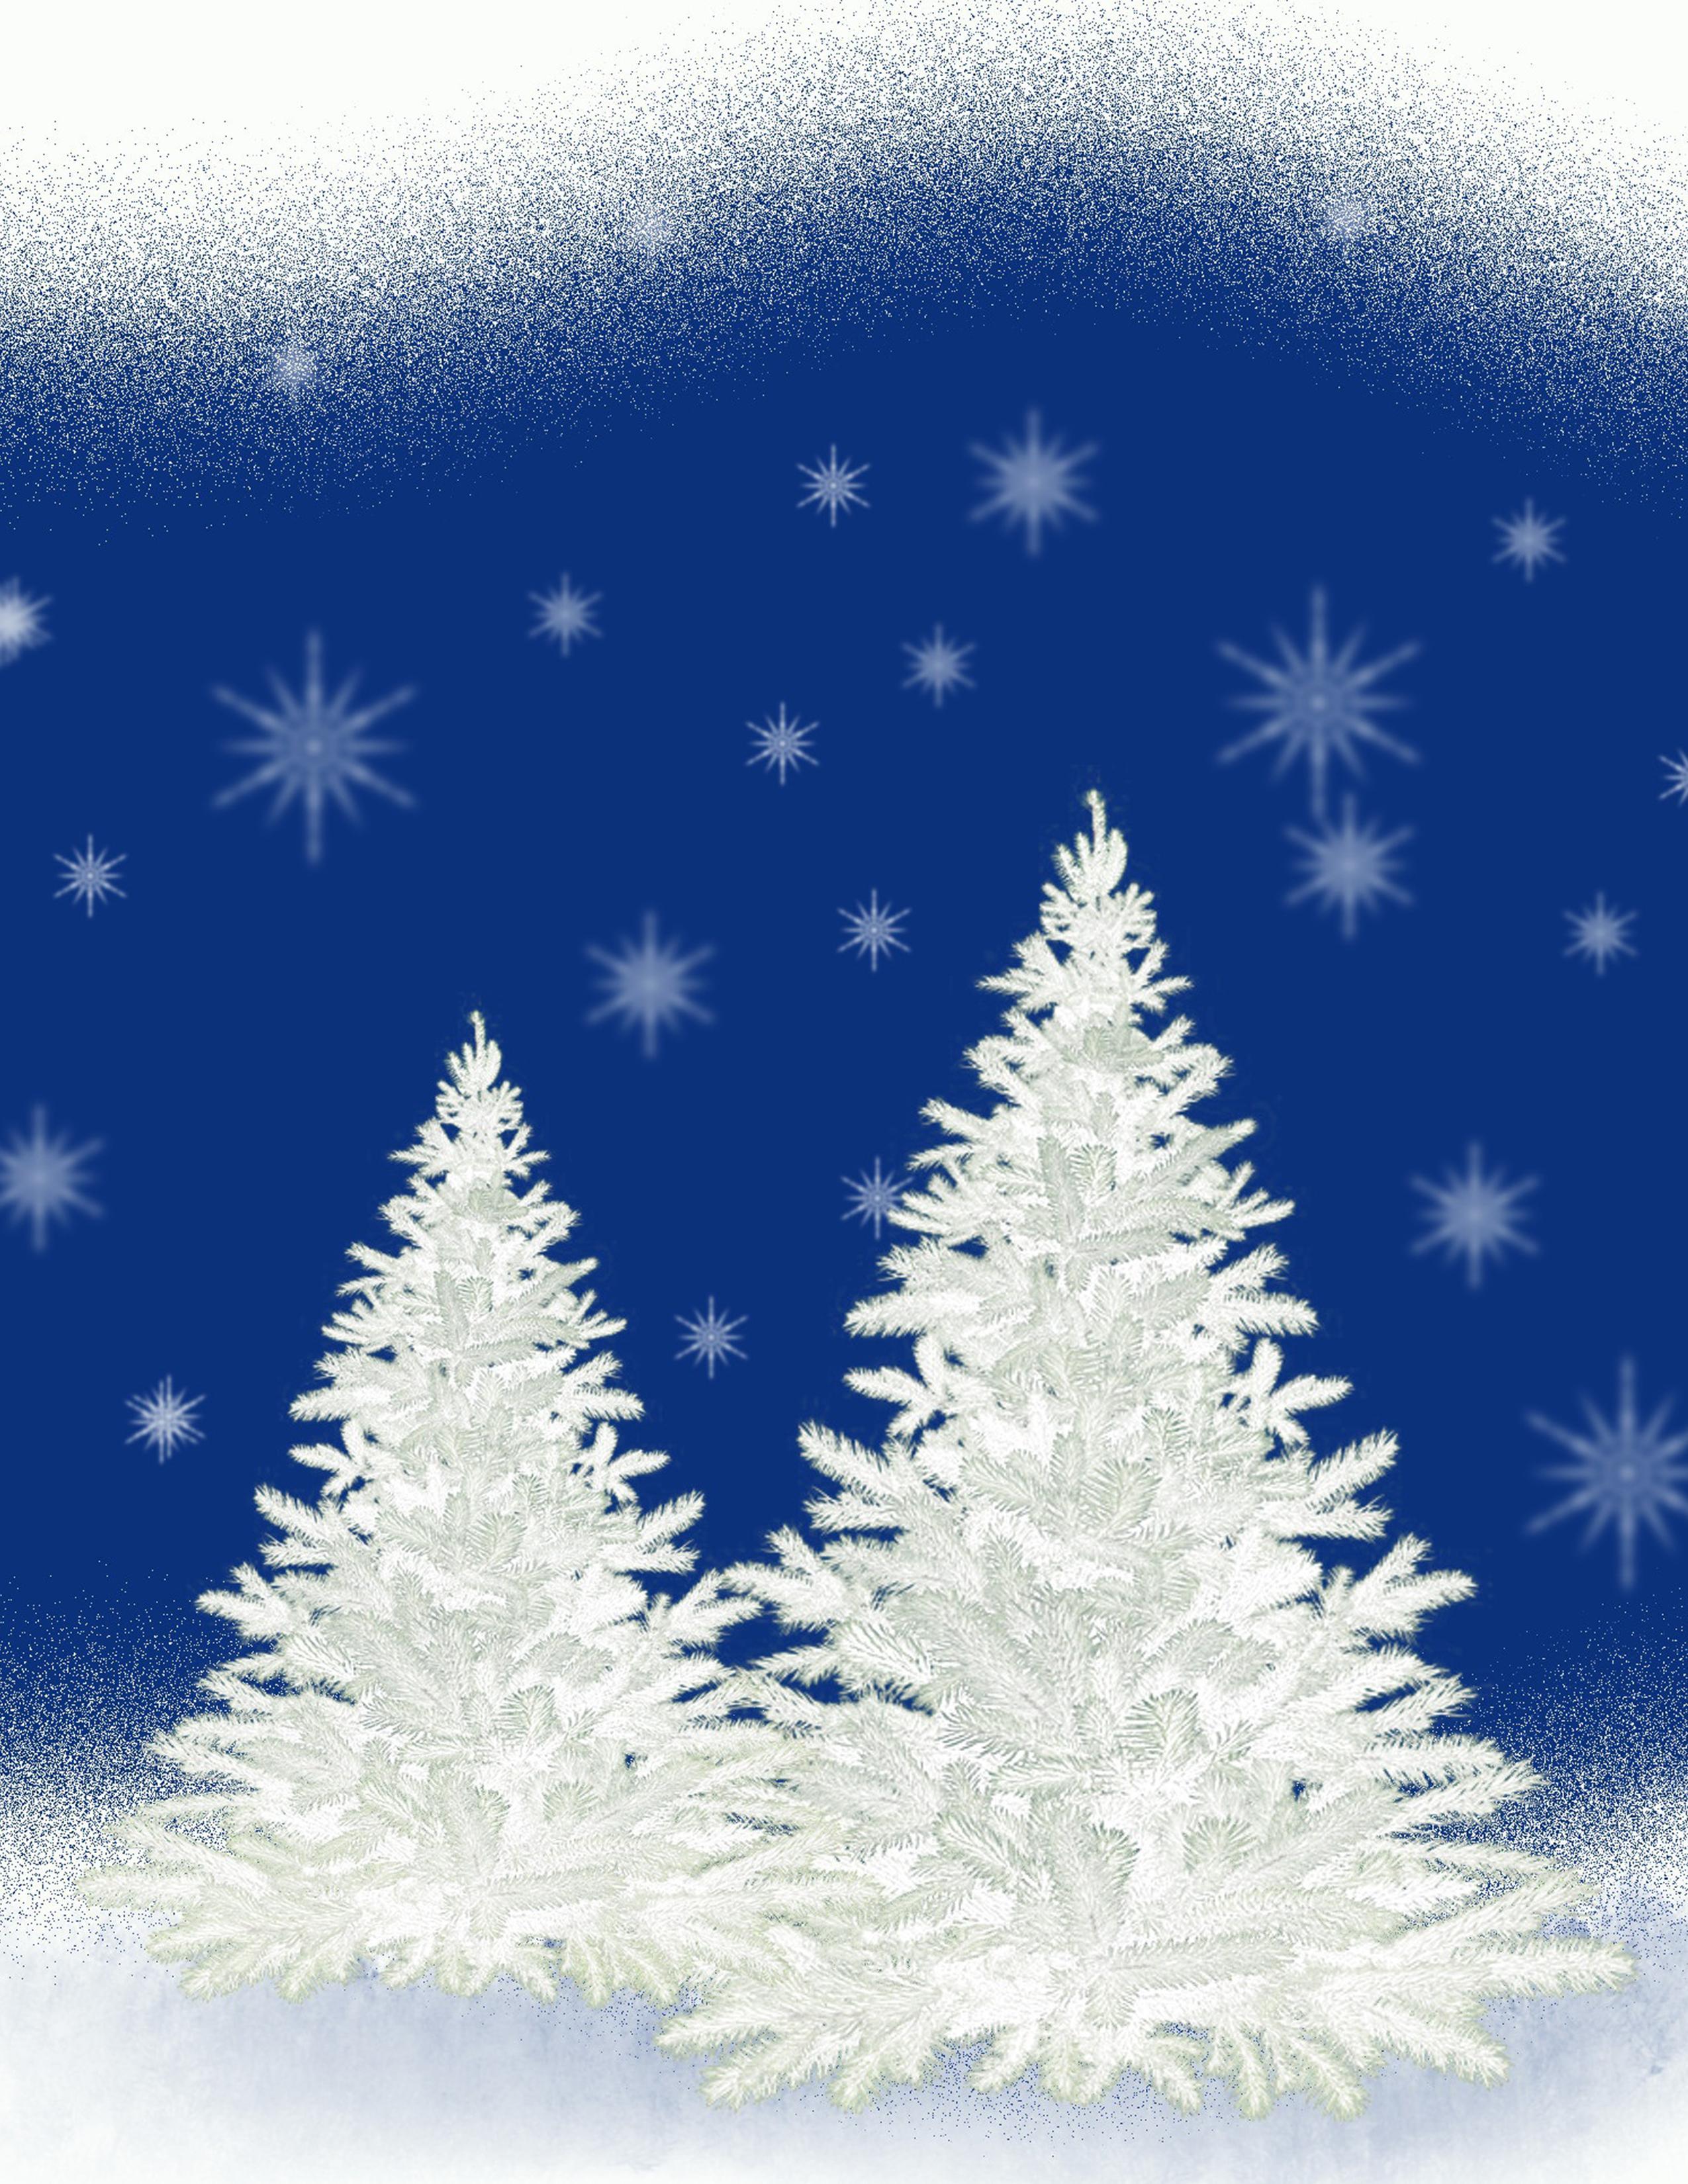 White Pine Trees on Blue Background Christmas Printable